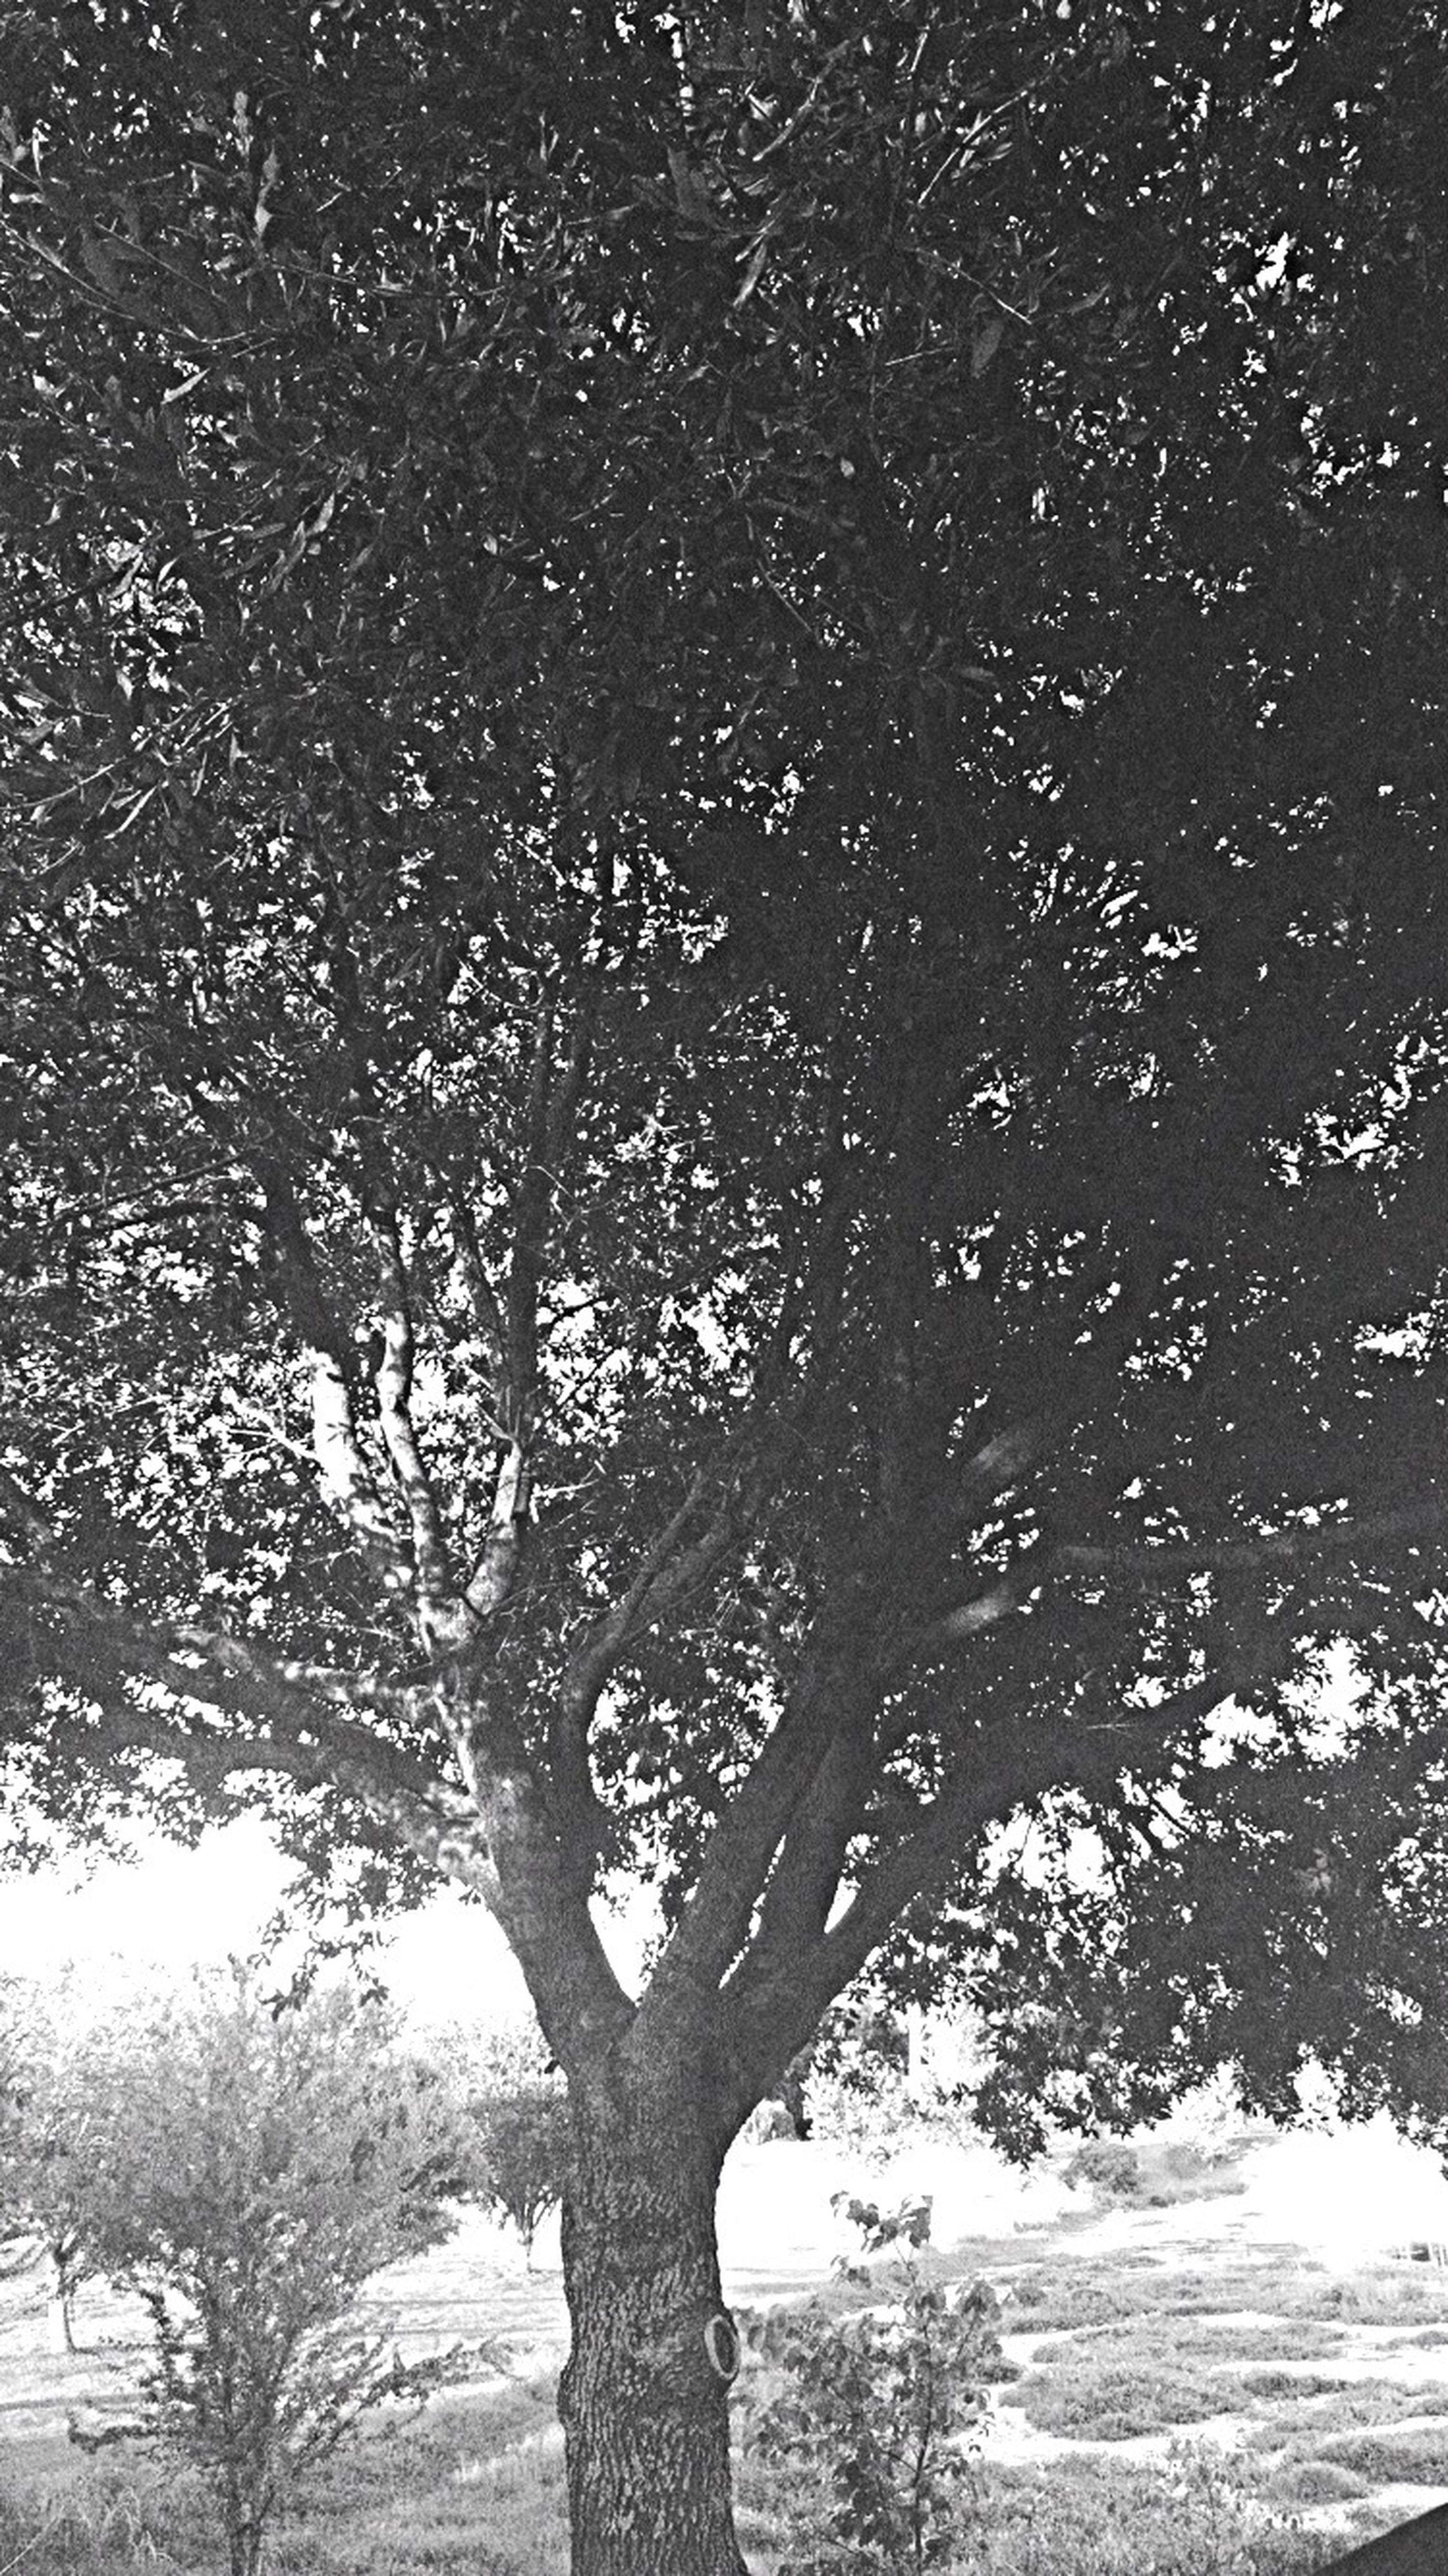 Beauty in darkness Blackandwhitetreephoto Checkitout Views Trees Angles Upcloseview EyeemPhotos Nature Natural